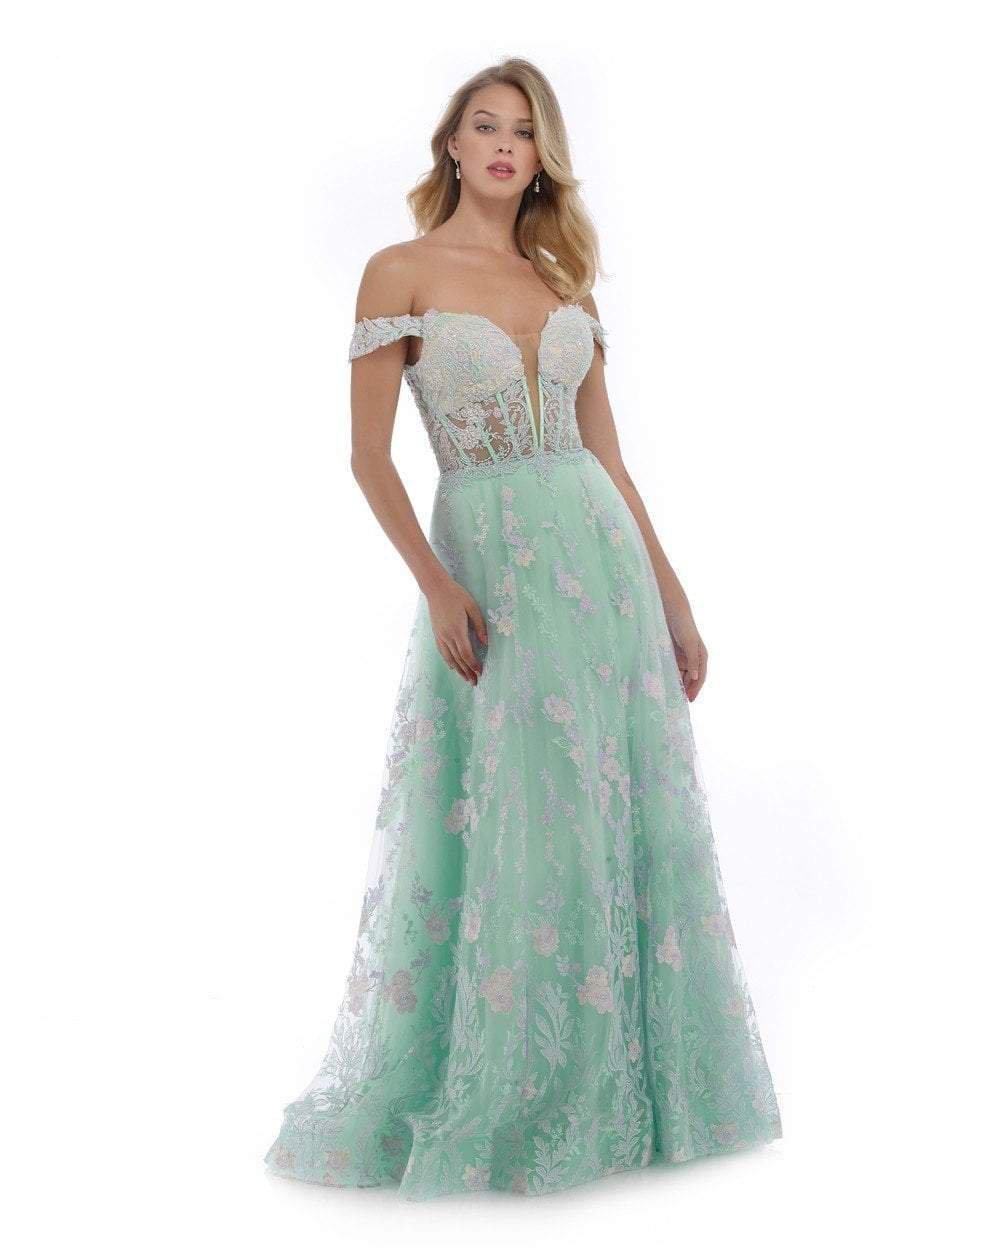 Morrell Maxie - 16085 Floral Appliques Off-Shoulder A-Line Gown